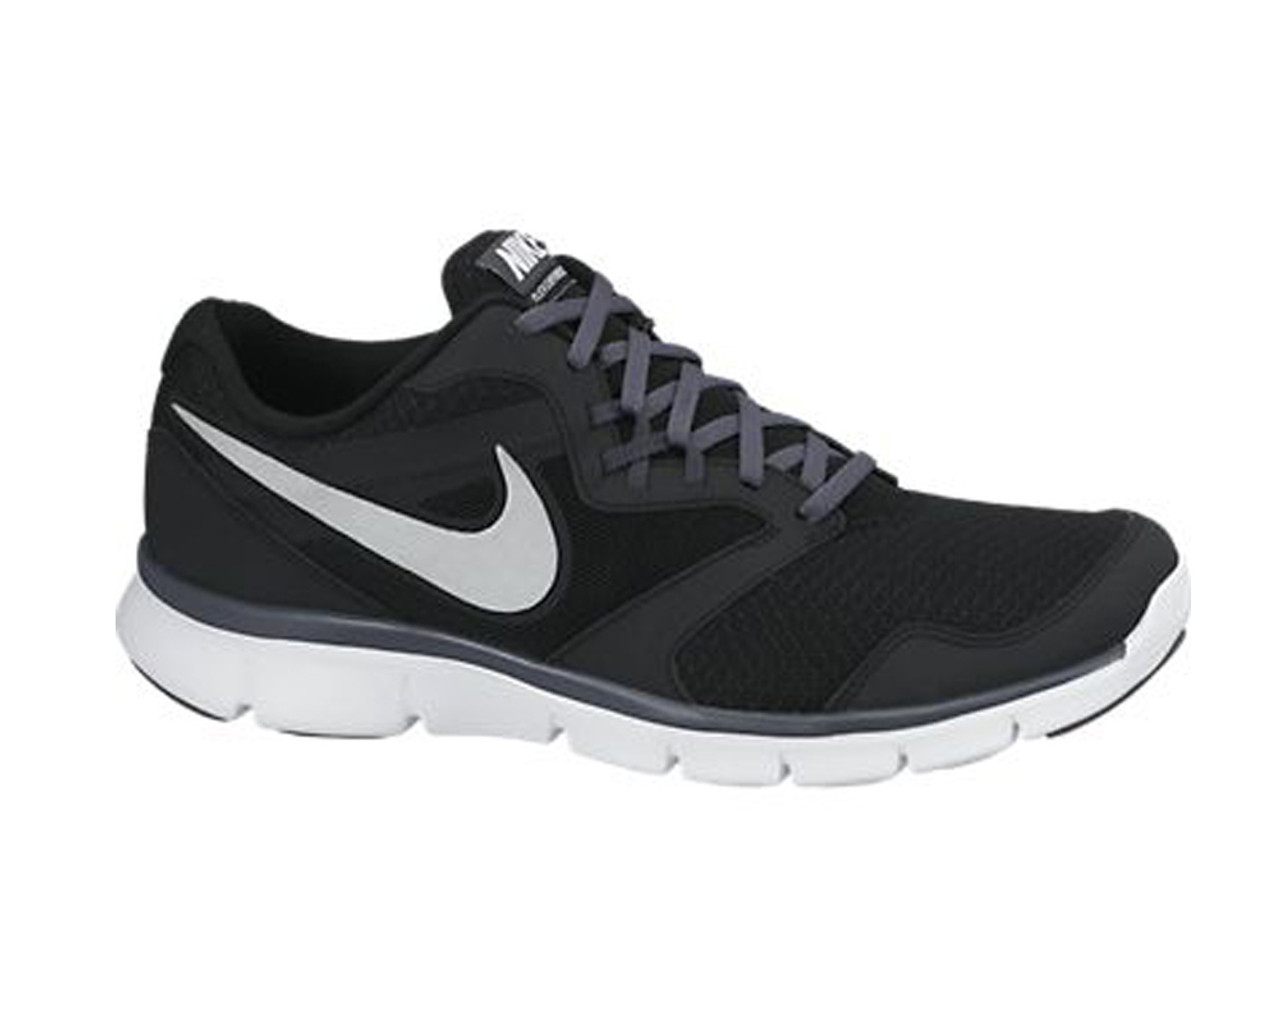 136a63b98beb Nike Men s Flex Experience Run 3 Running Shoes Black Grey - Shop now    Shoolu